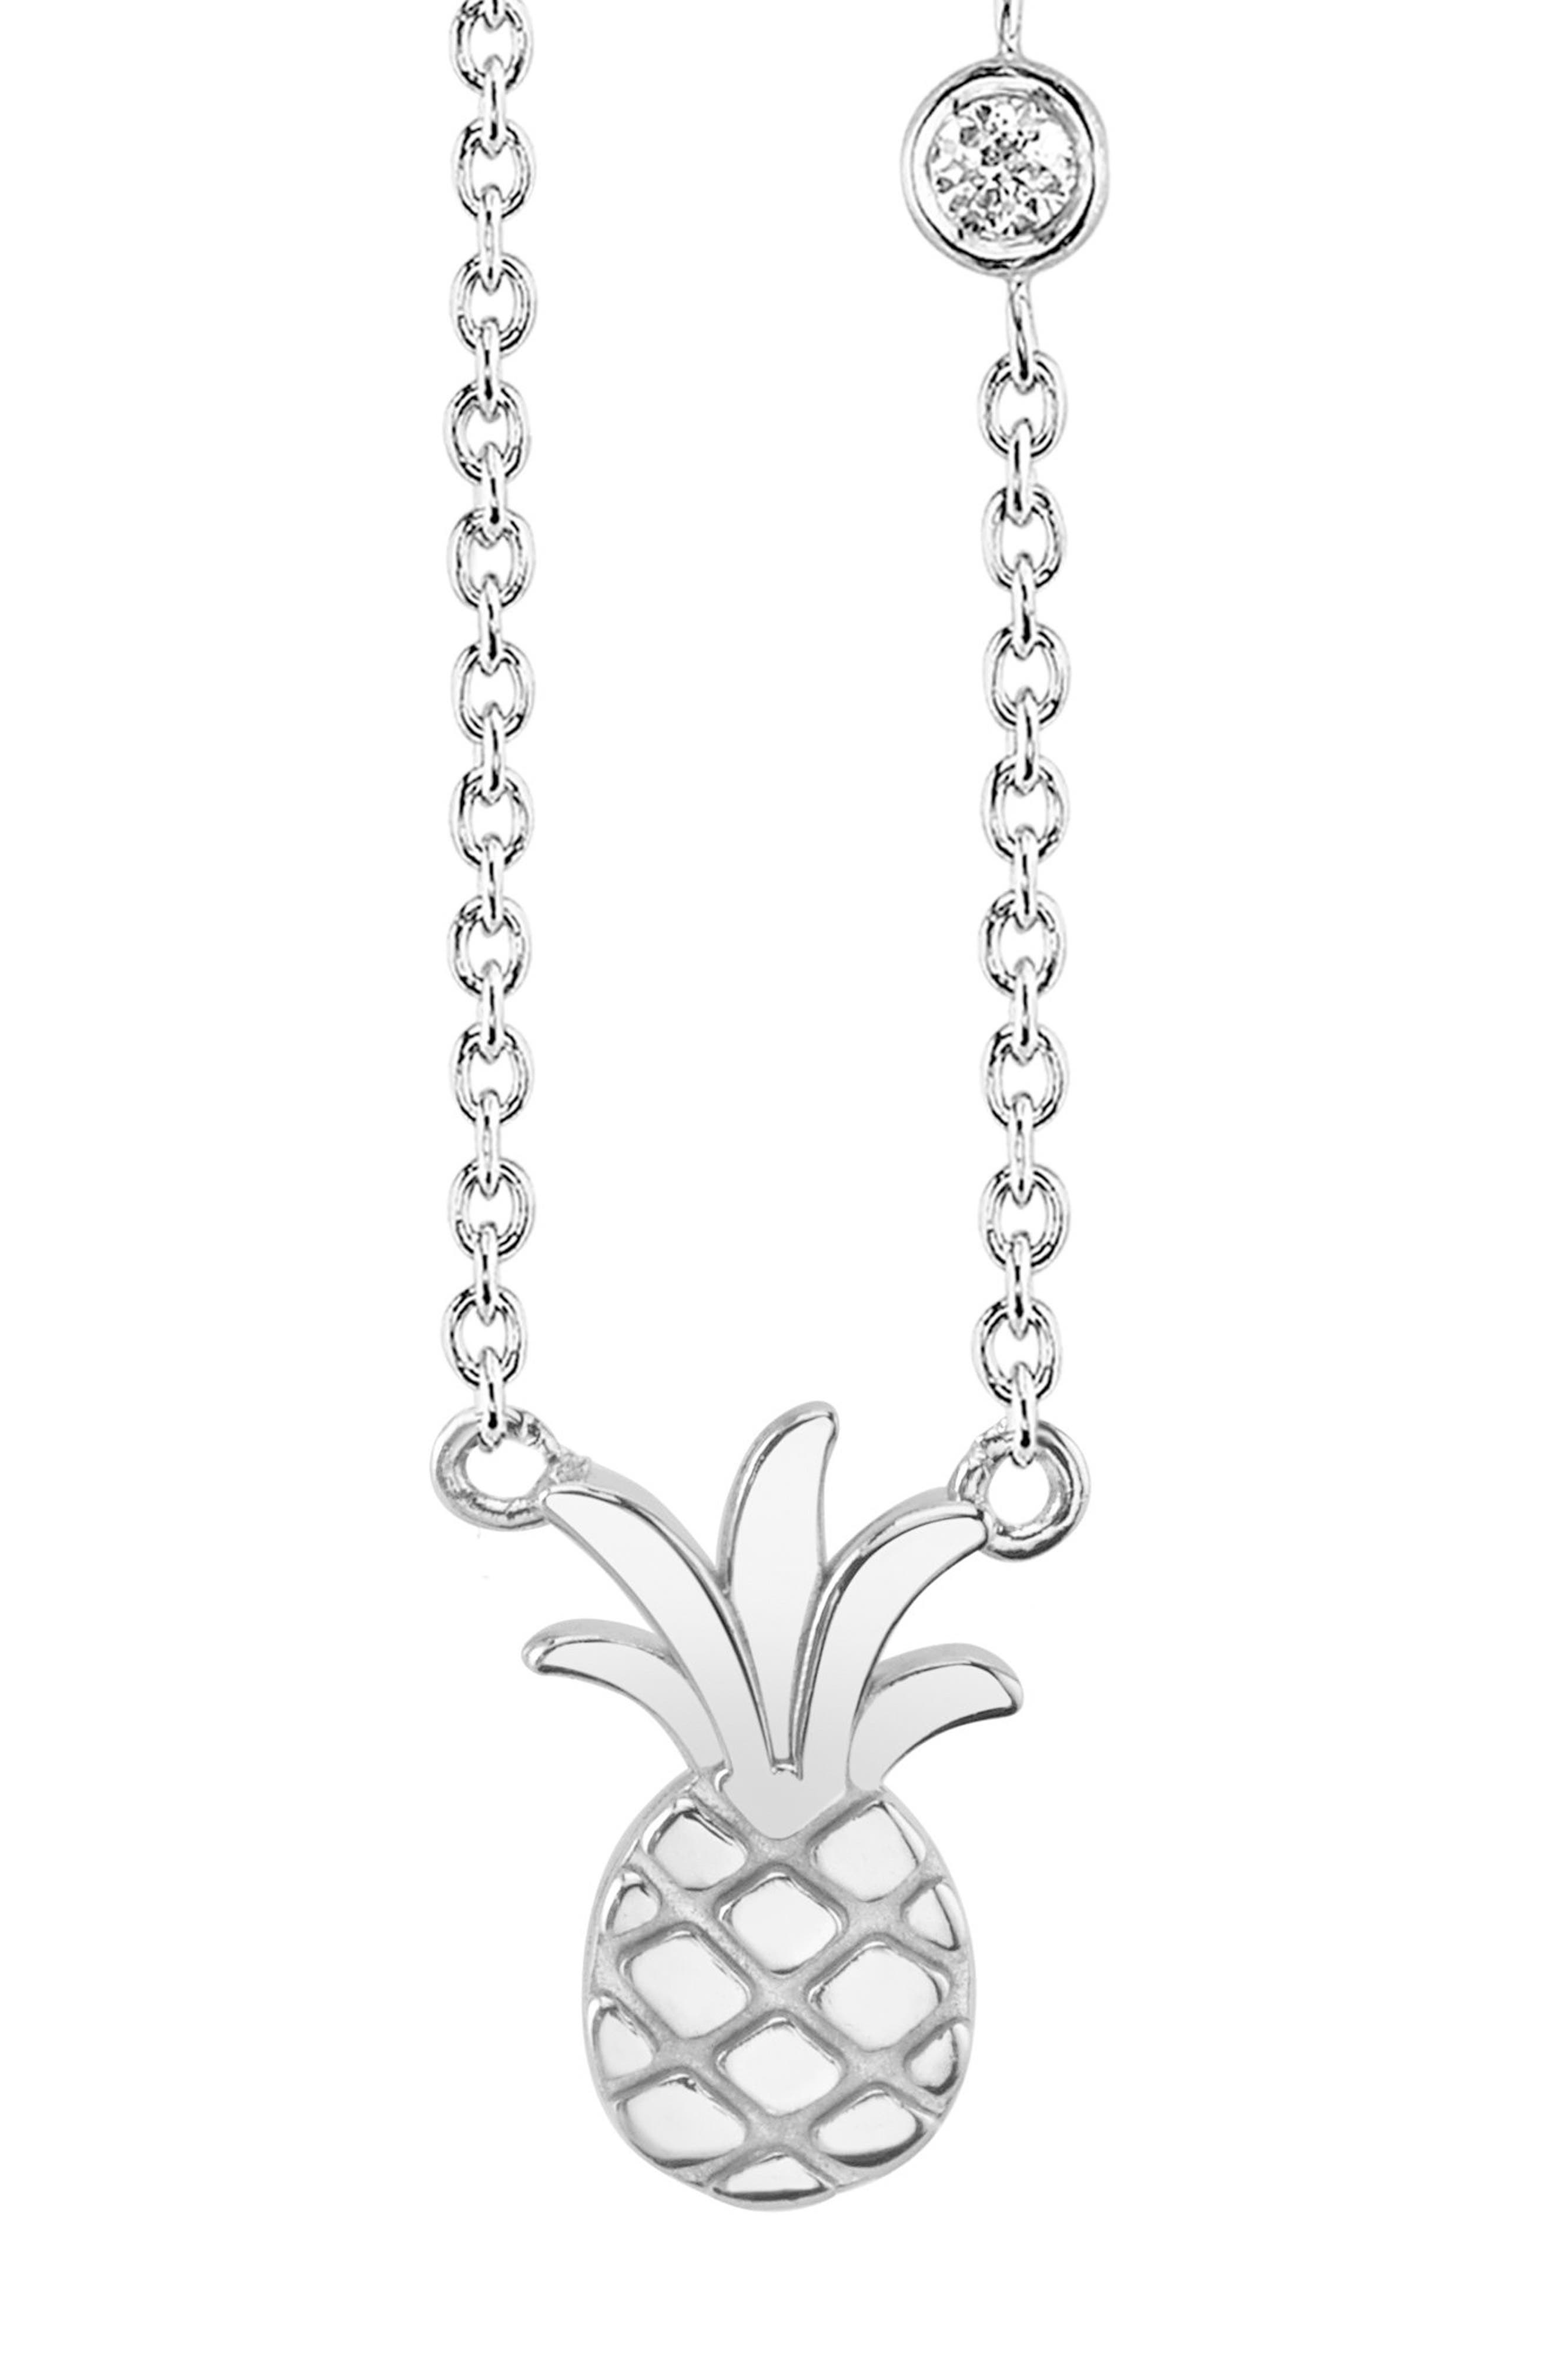 Shy by SE Pineapple Diamond Pendant Necklace